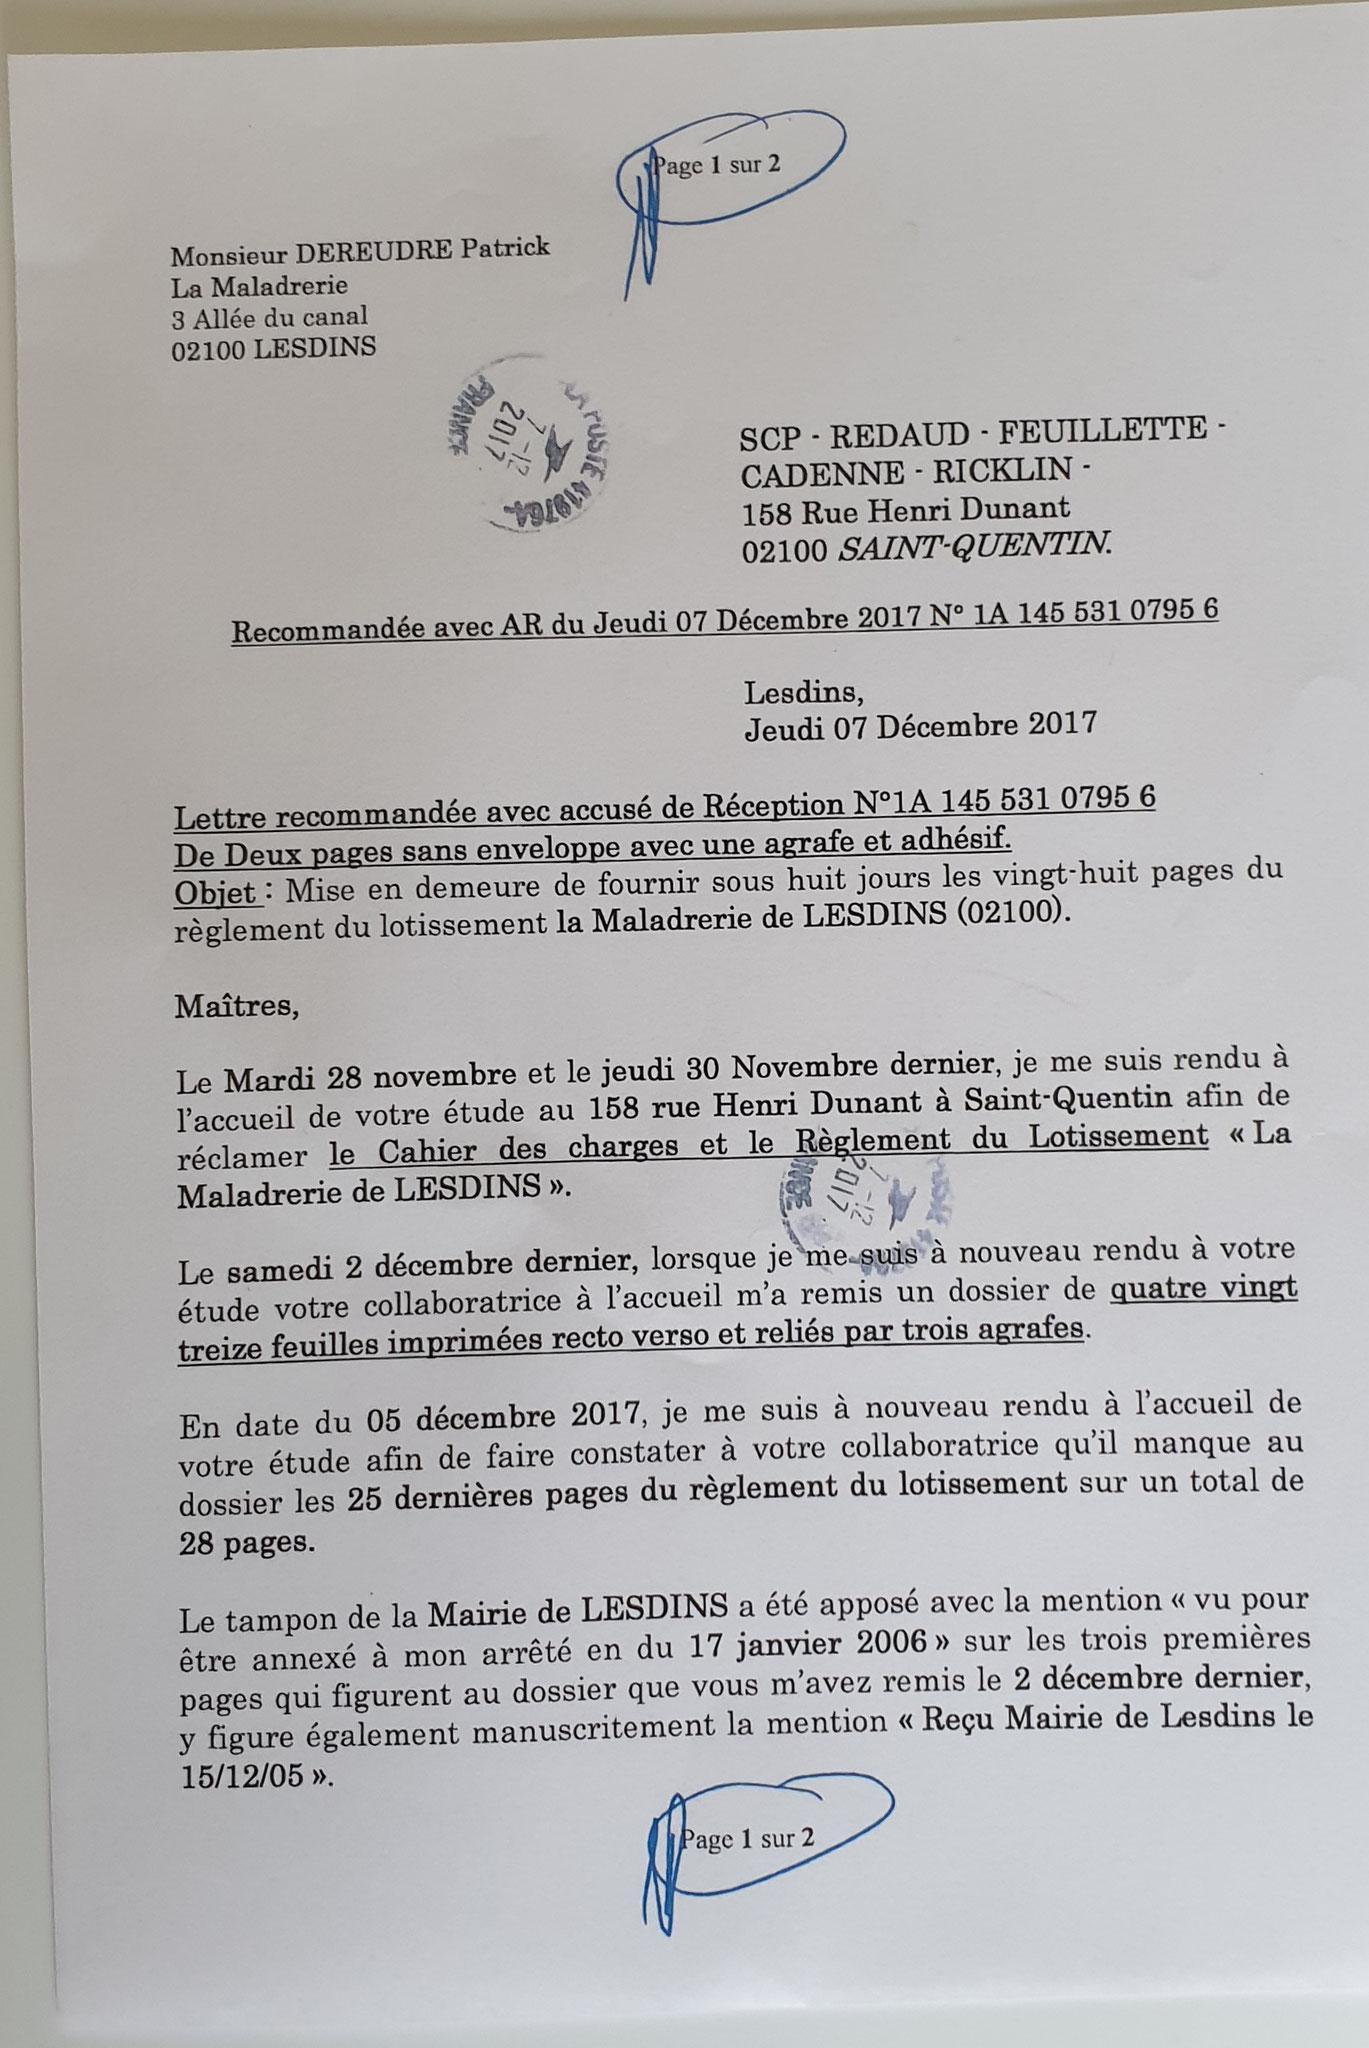 Le 07 décembre 2017 LRAR N0 1A 145 531 0795 6  (deux pages) www.jenesuispasunchien.fr www.jesuisvictime.fr www.jesuispatrick.fr